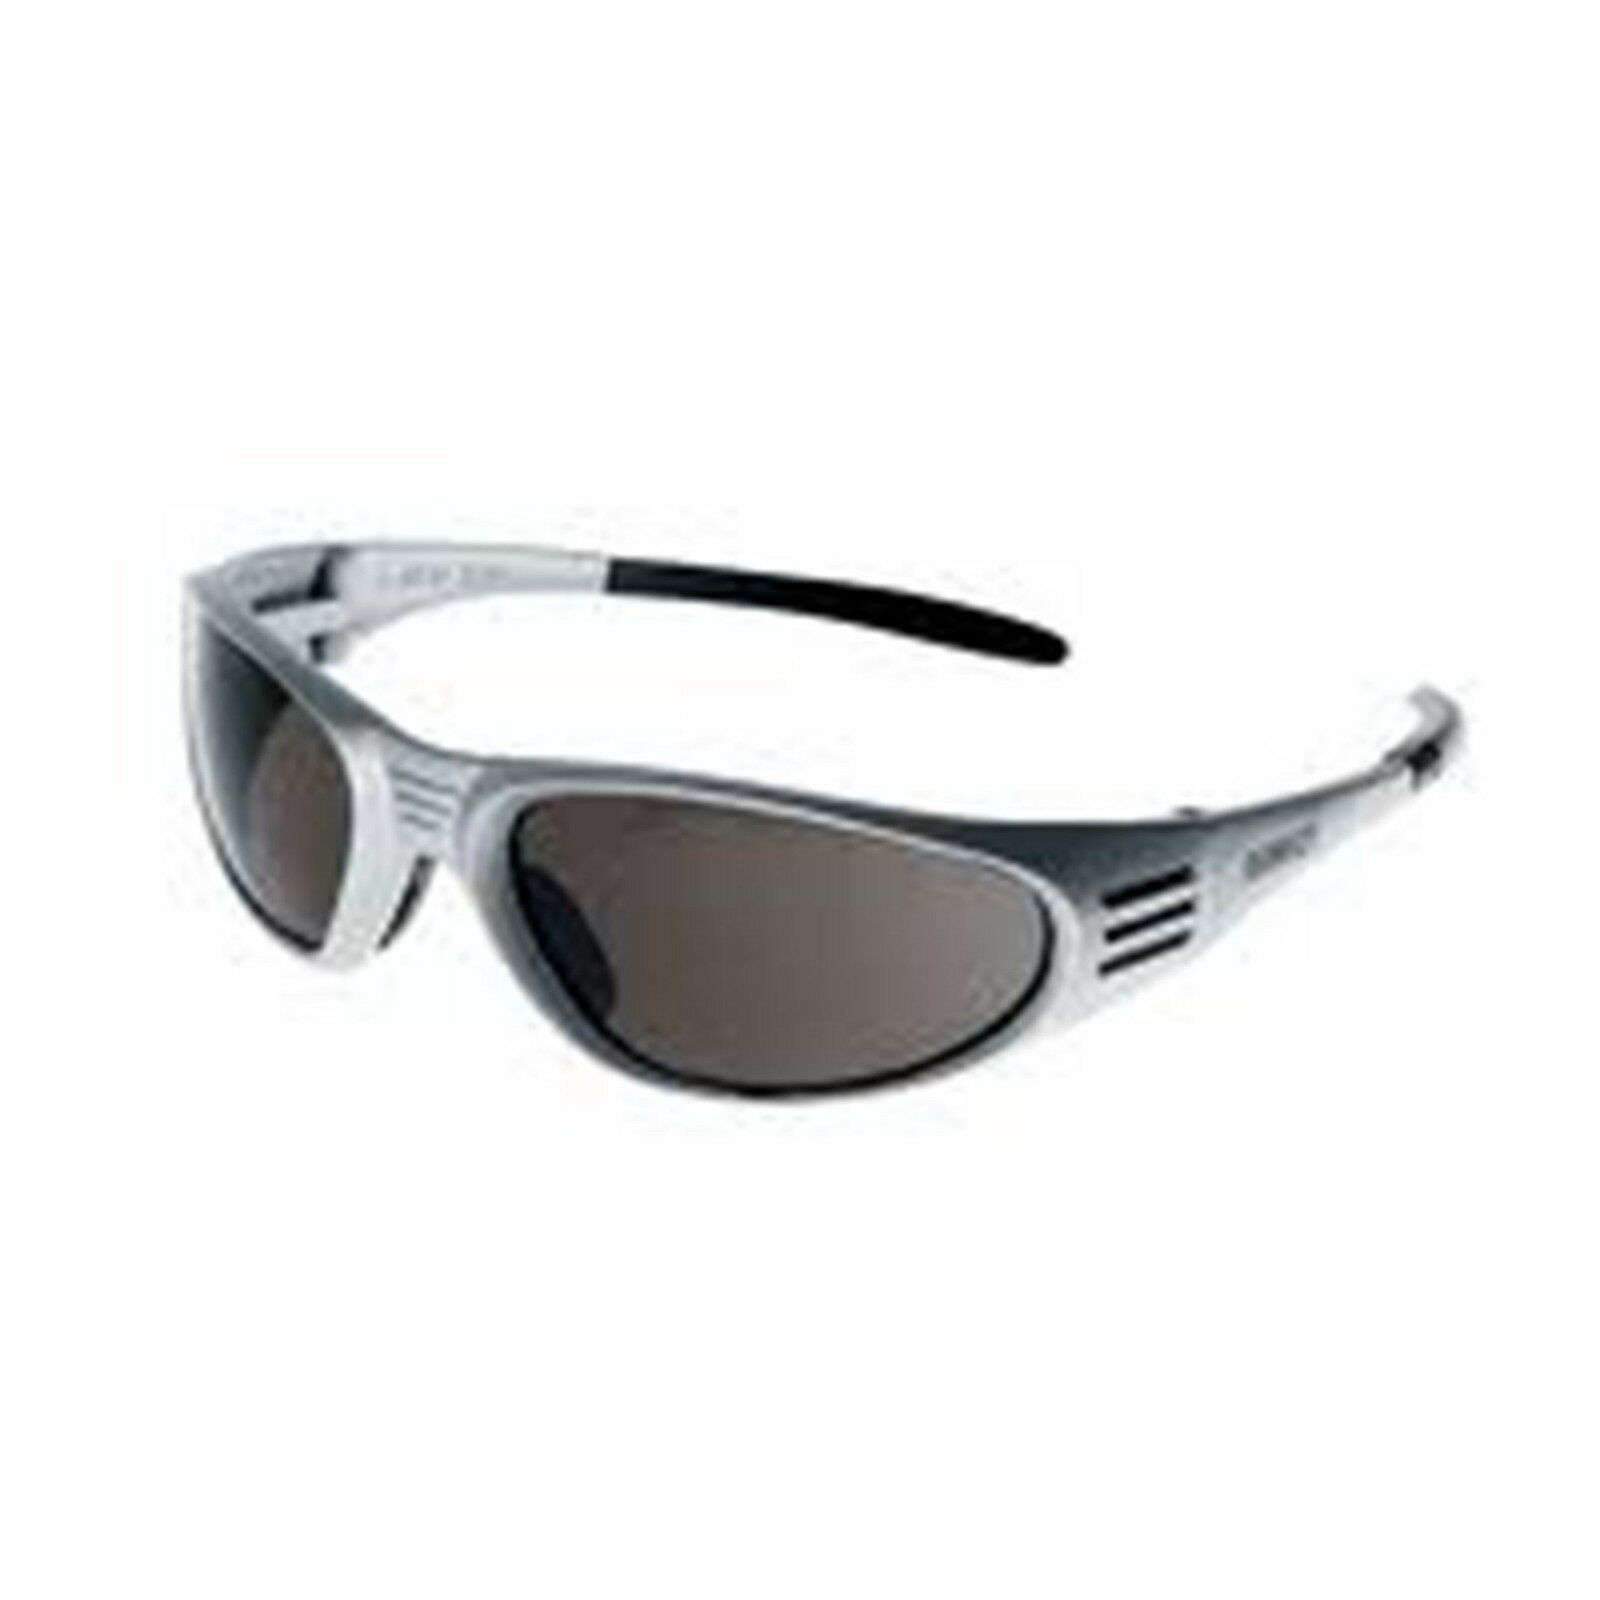 DeWalt VENTILATOR Safety Glasses BlacK Frames Yellow FAST SHIPPING!